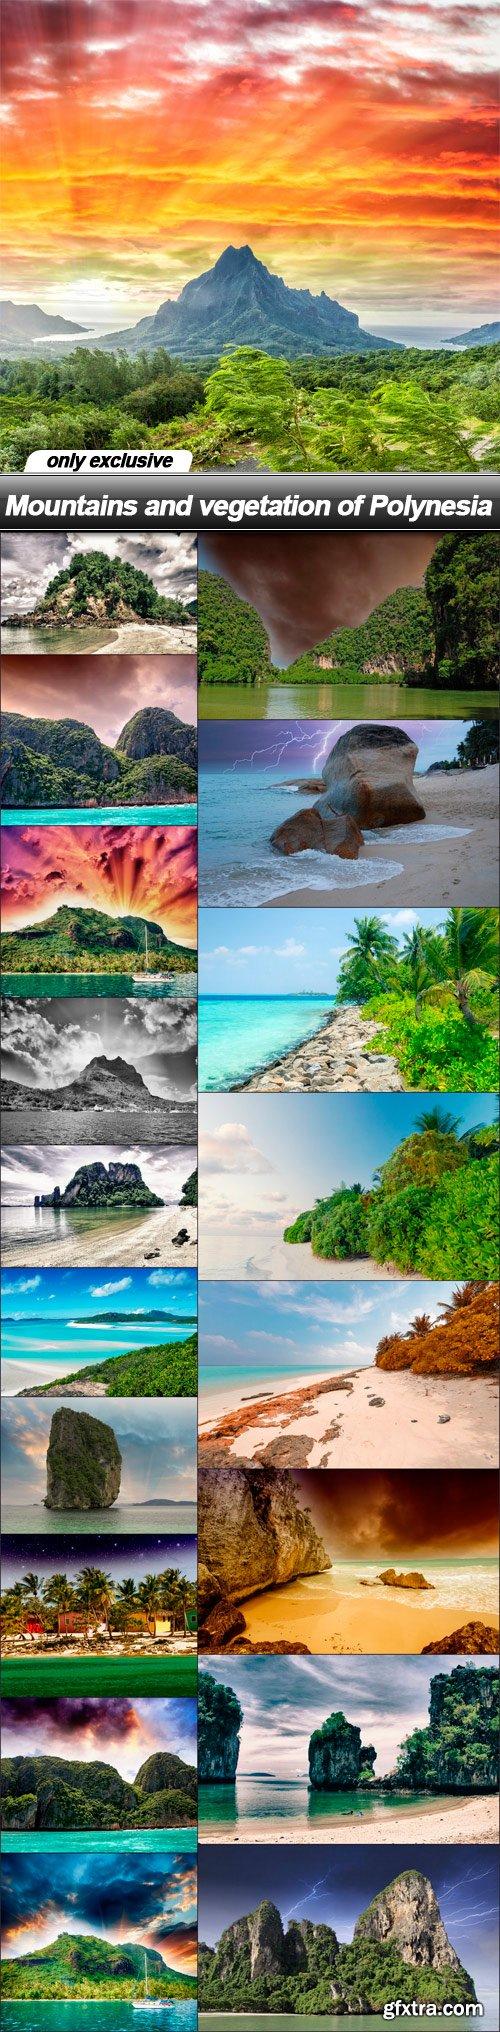 Mountains and vegetation of Polynesia - 19 UHQ JPEG